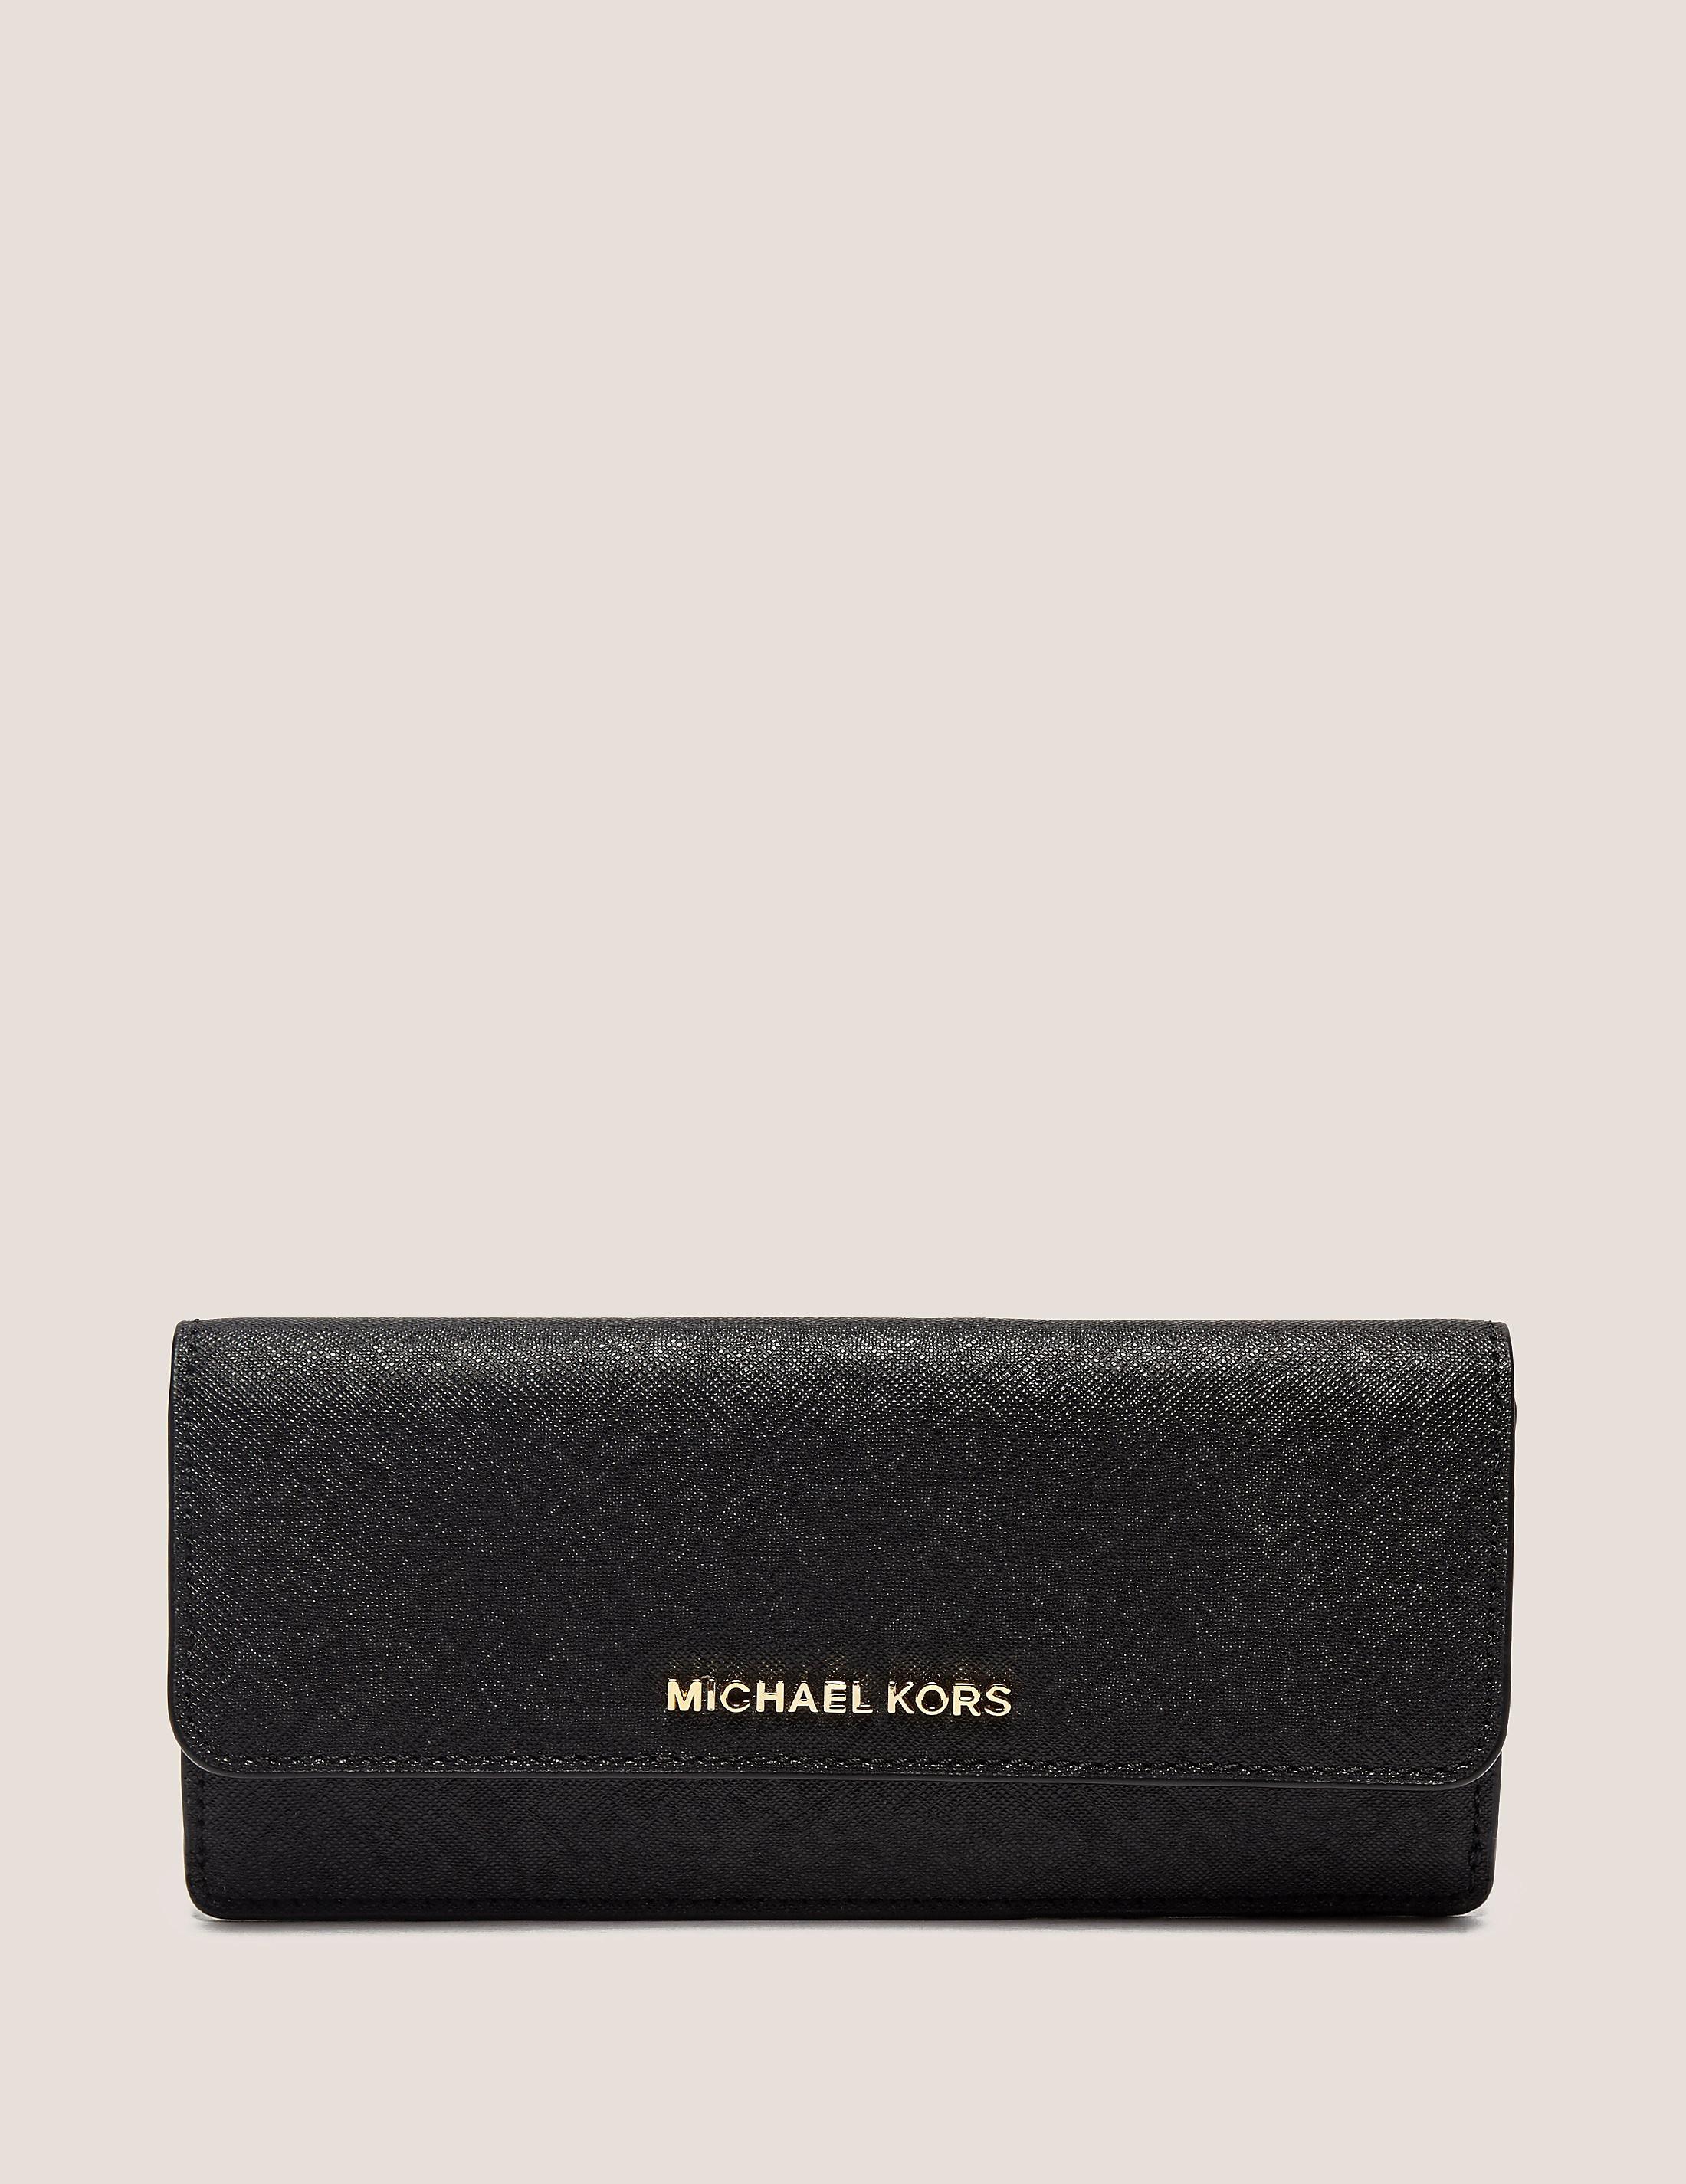 Michael Kors Jestset Travel Set Wallet